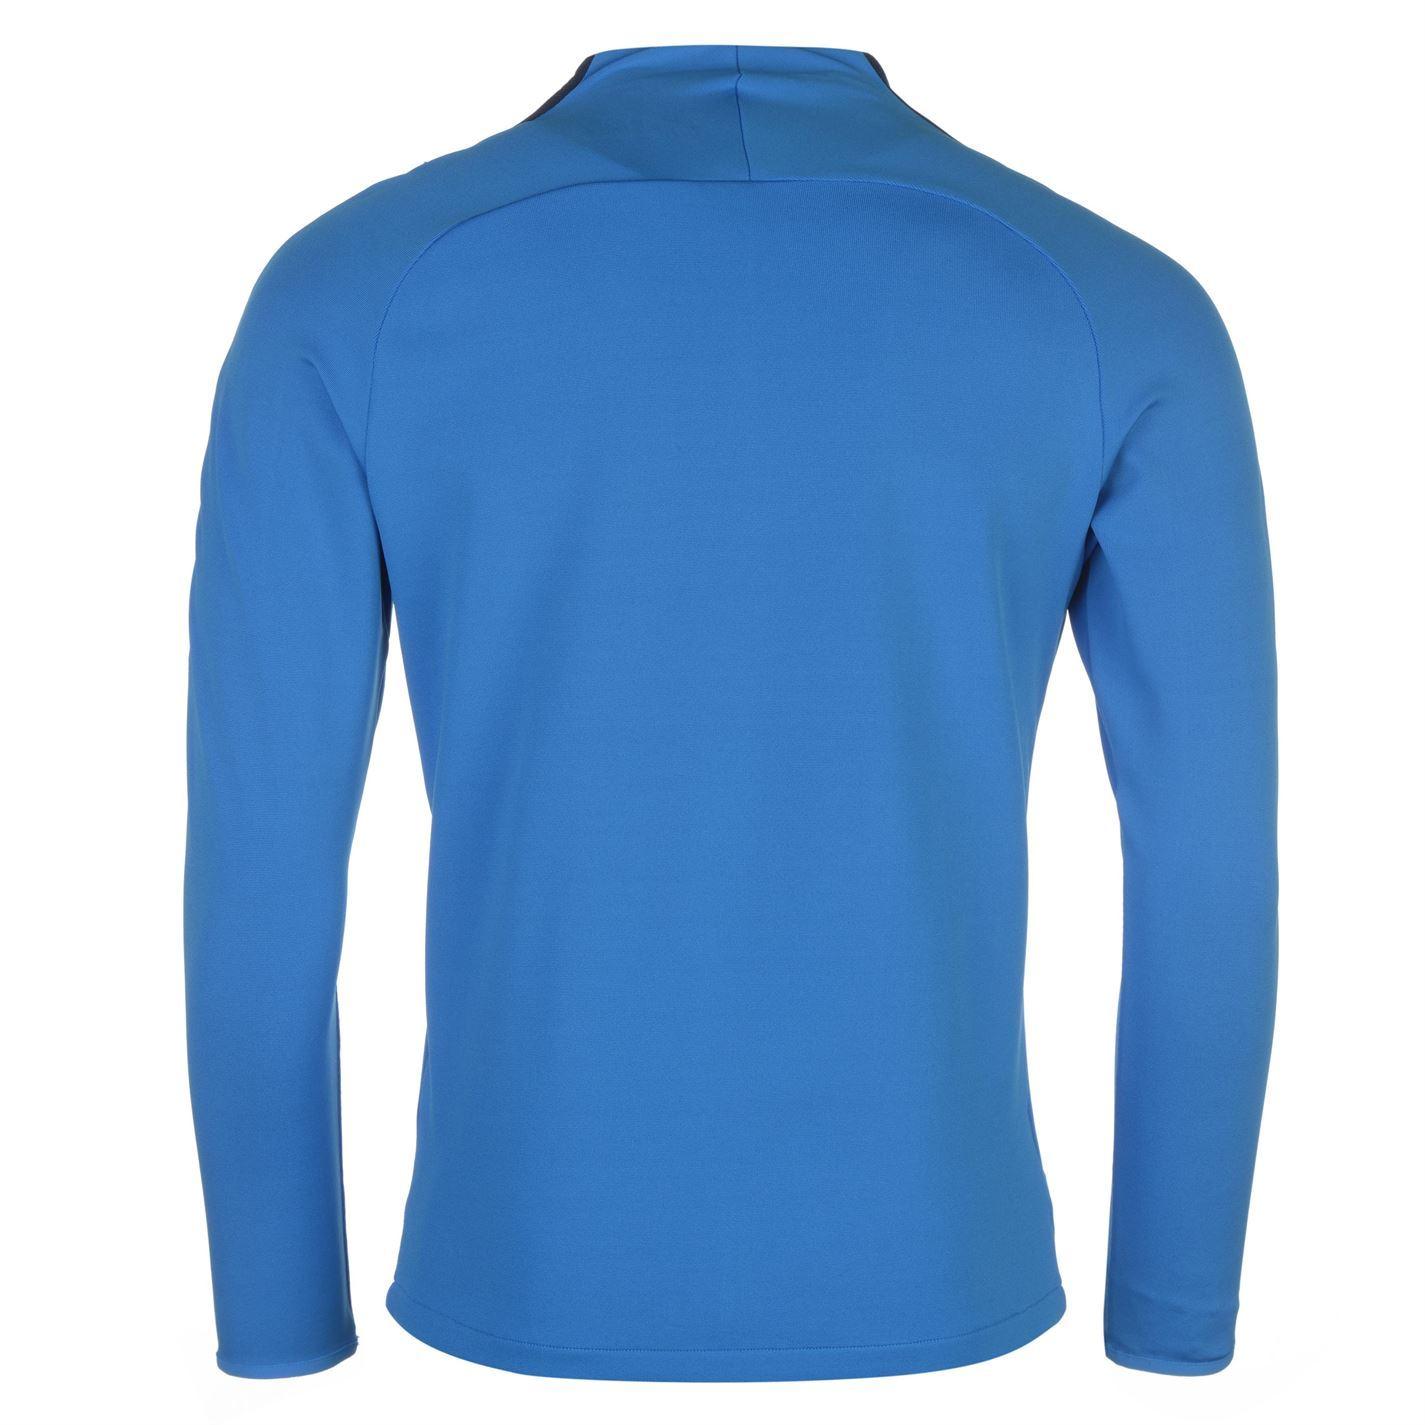 aa334beb23176 ... Nike Tottenham Hotpsur Track chaqueta para hombre azul blanco fútbol  fútbol chándal Top ...